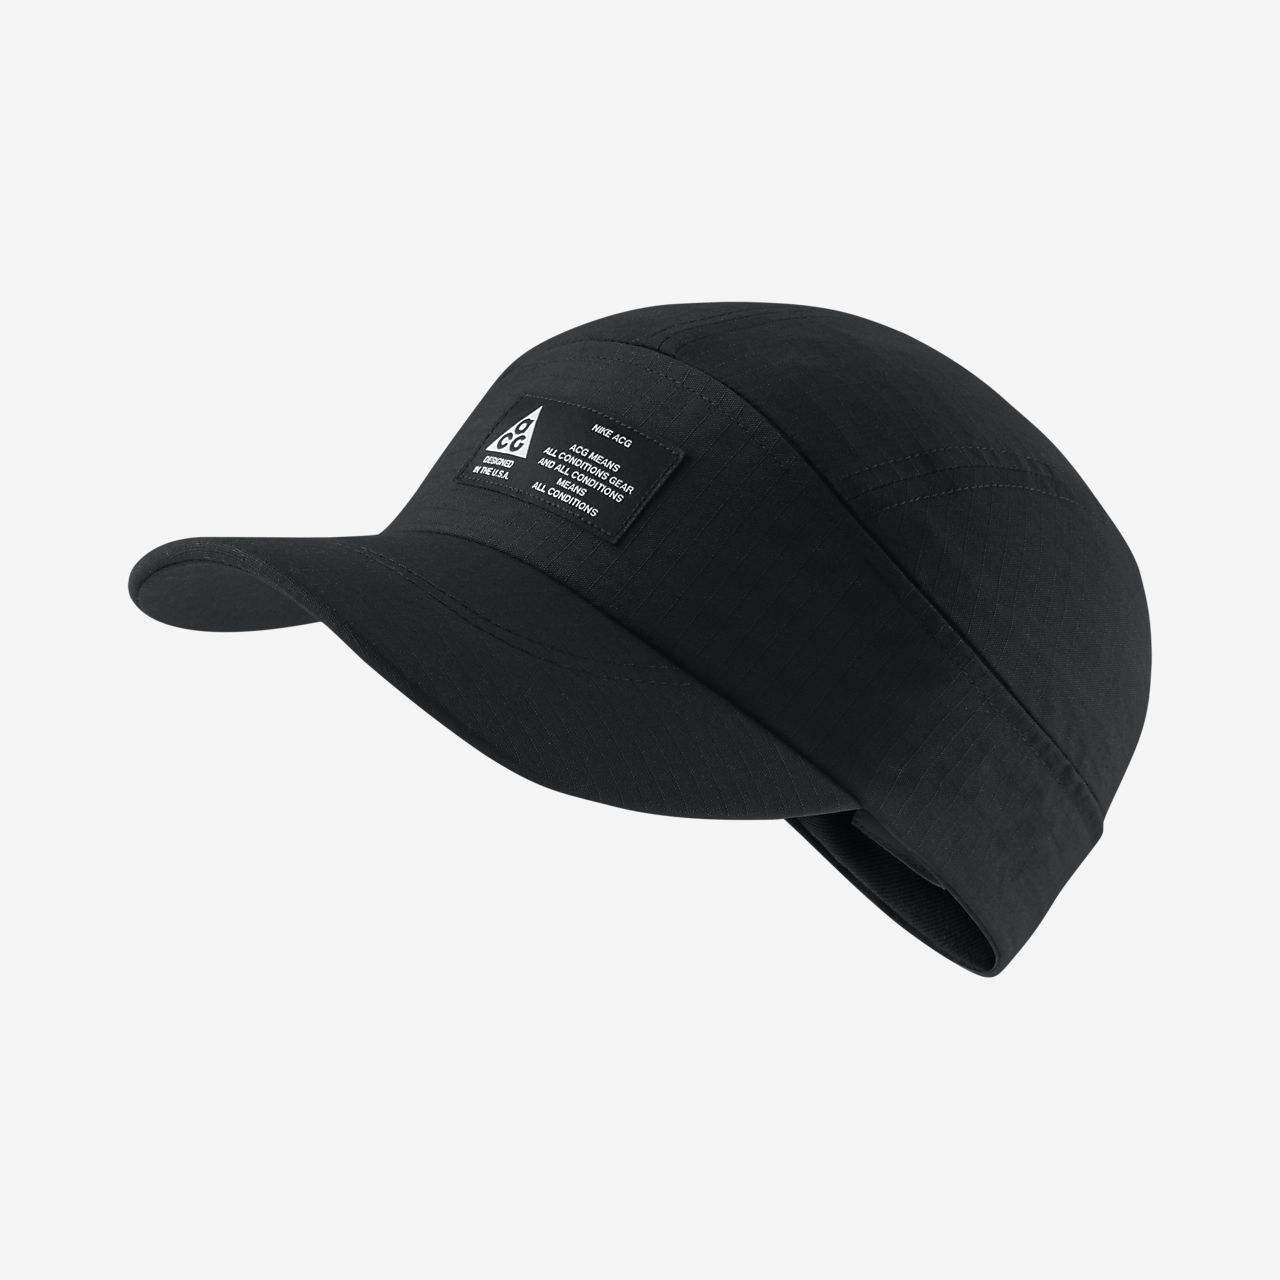 5b574a63f3a5a Nike ACG Tailwind Cap. Nike.com